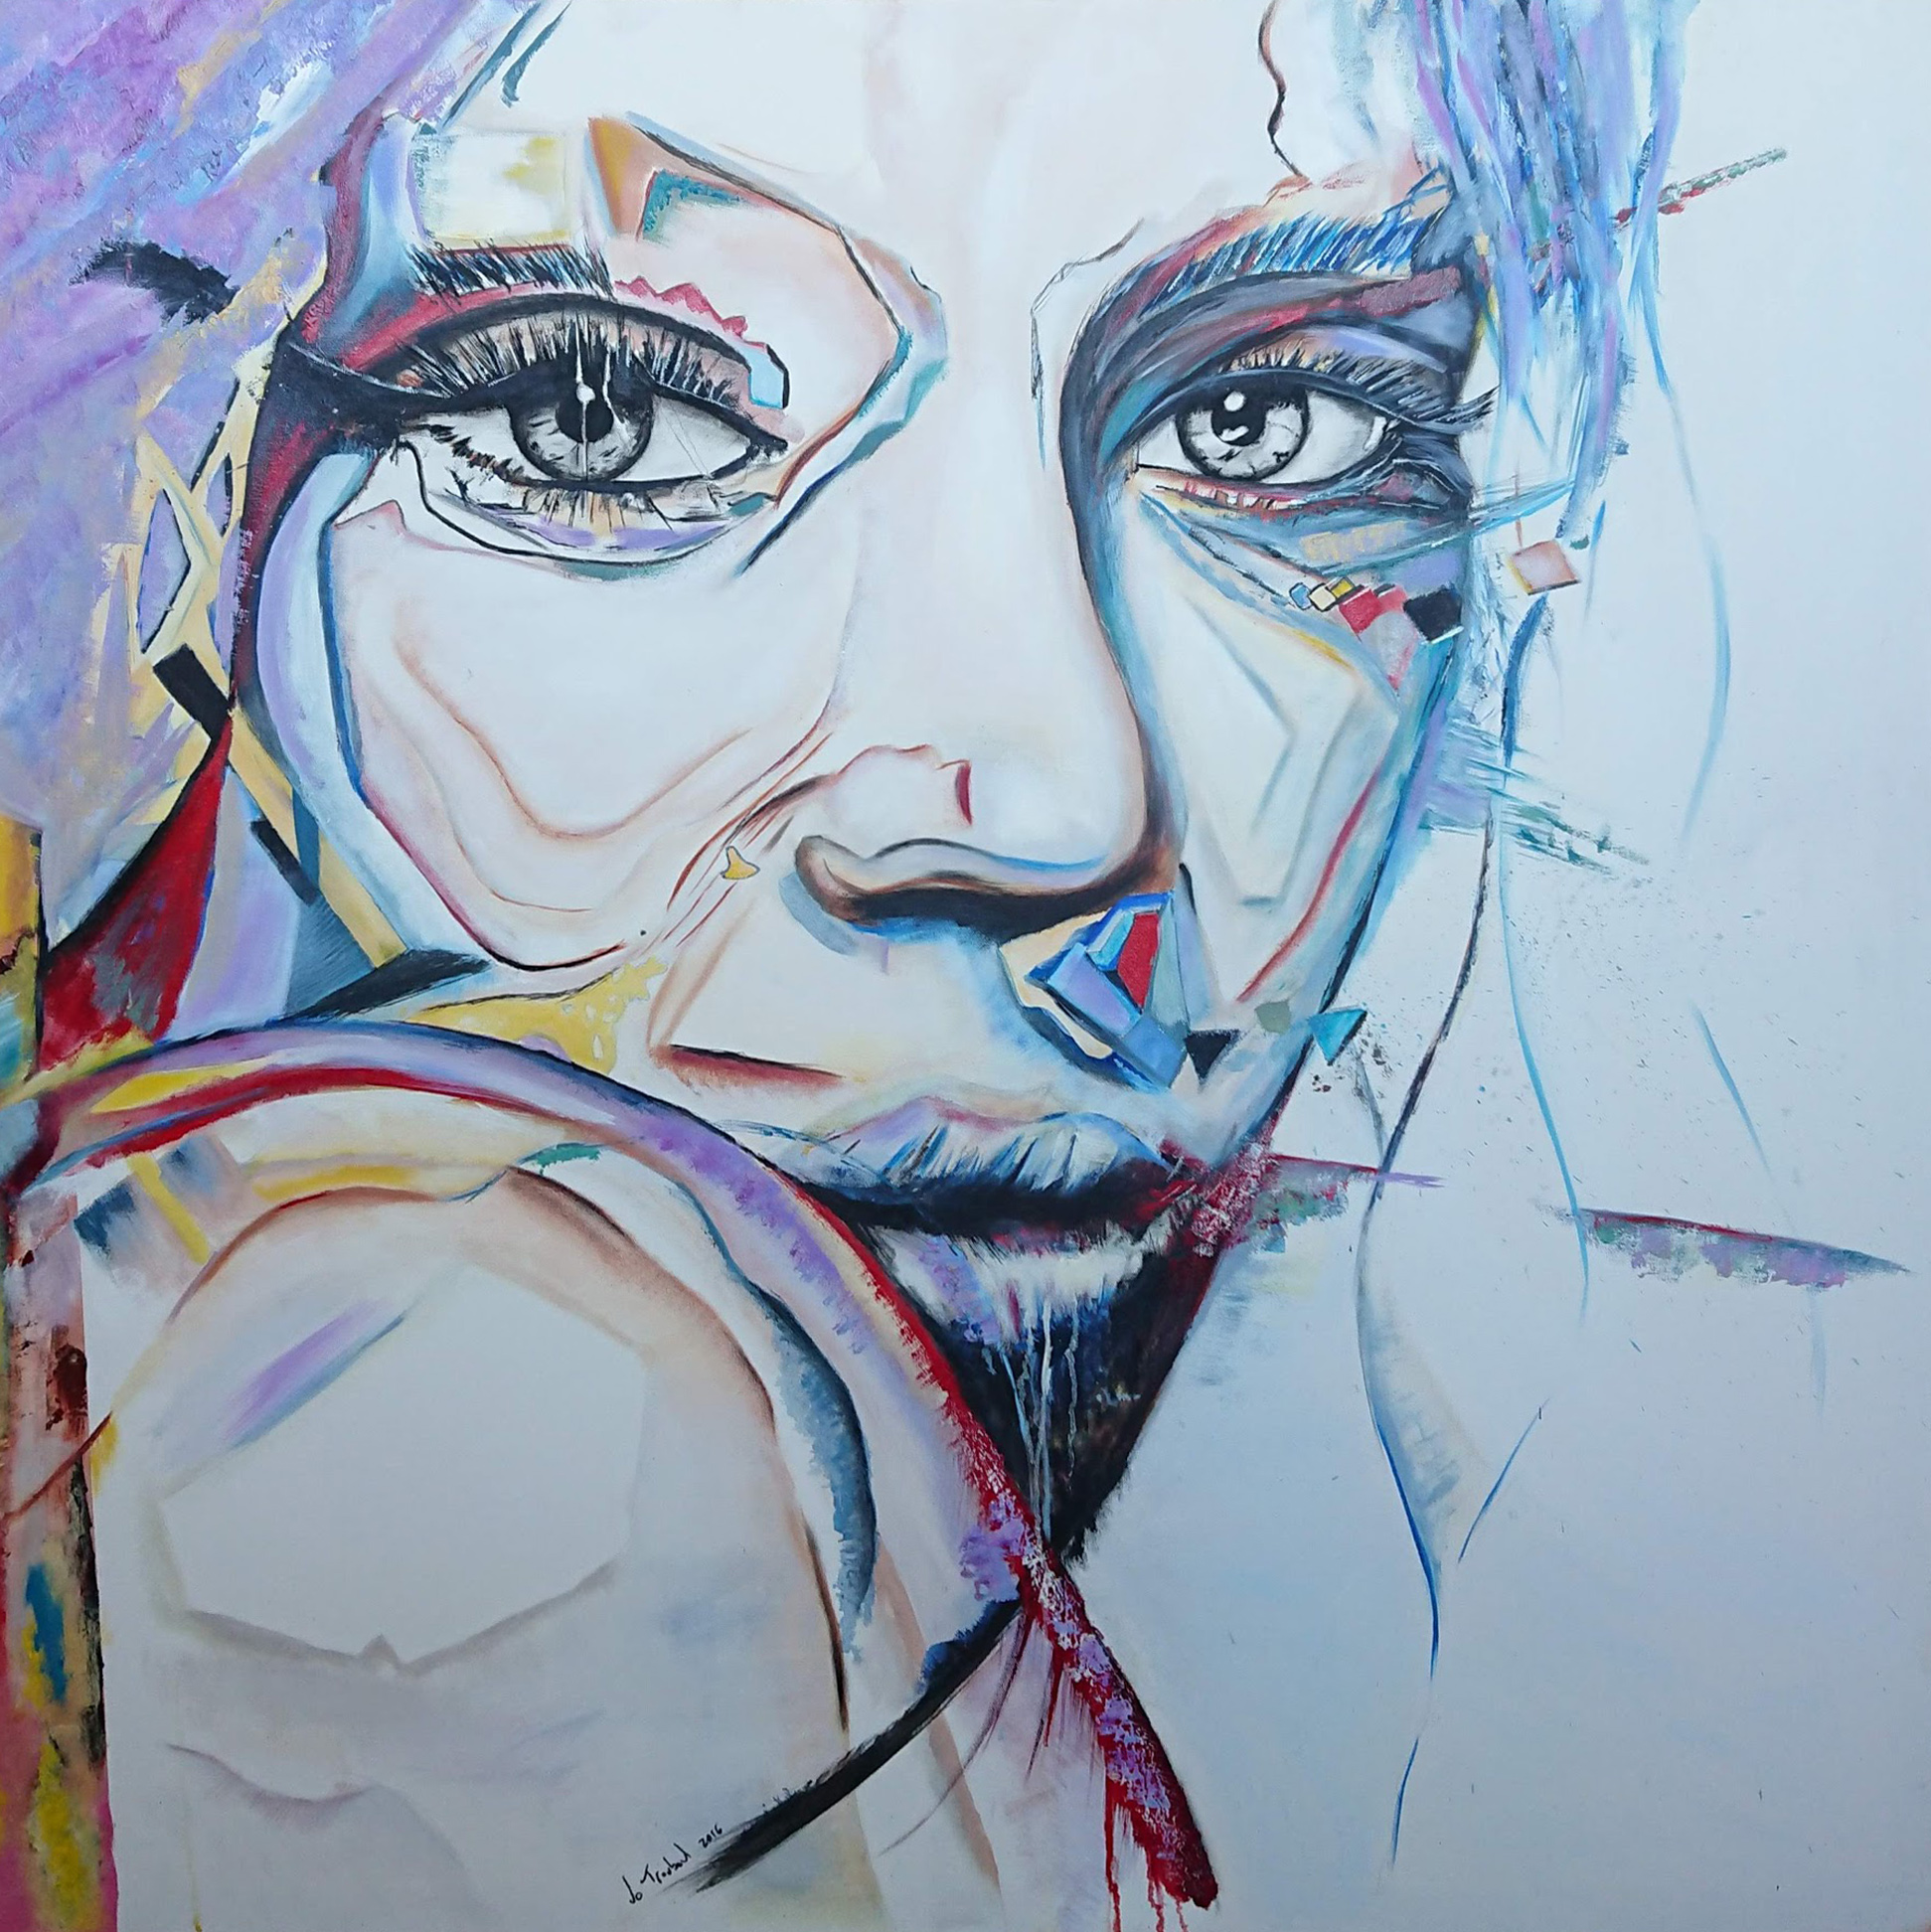 Evelyn  - by Jc Trouboul